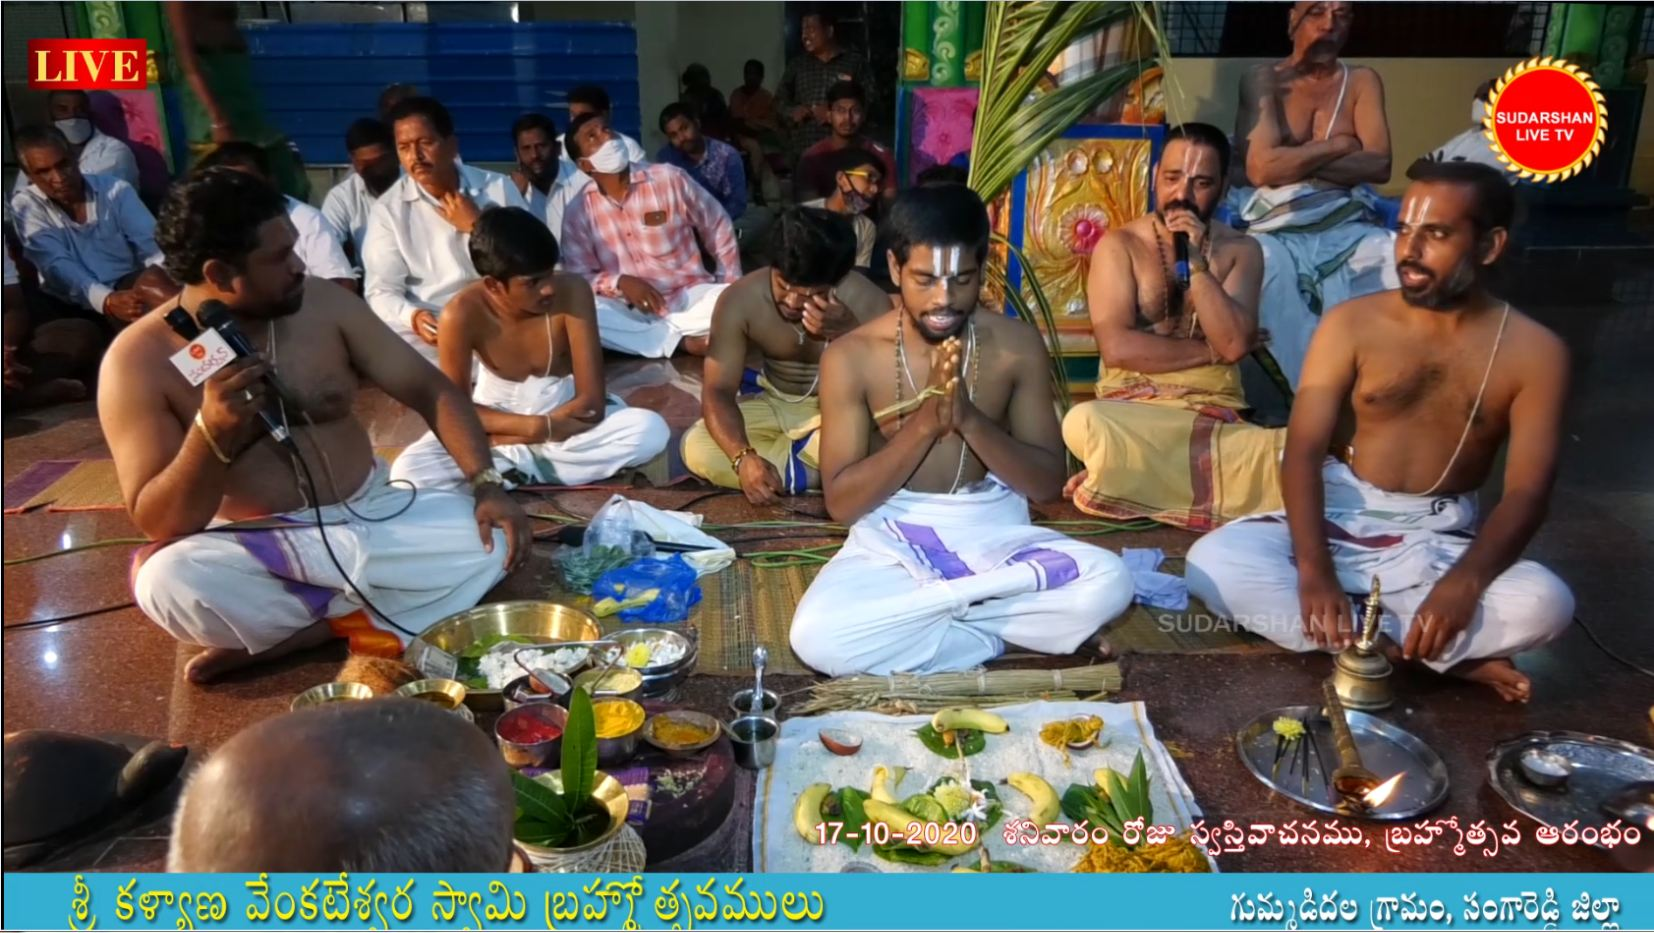 Gummadidala Kalyana Venkateswara Swamy Brahmostavamulu Day 1 Swastivachanam 17-10-2020 - Sudarshan Live Tv